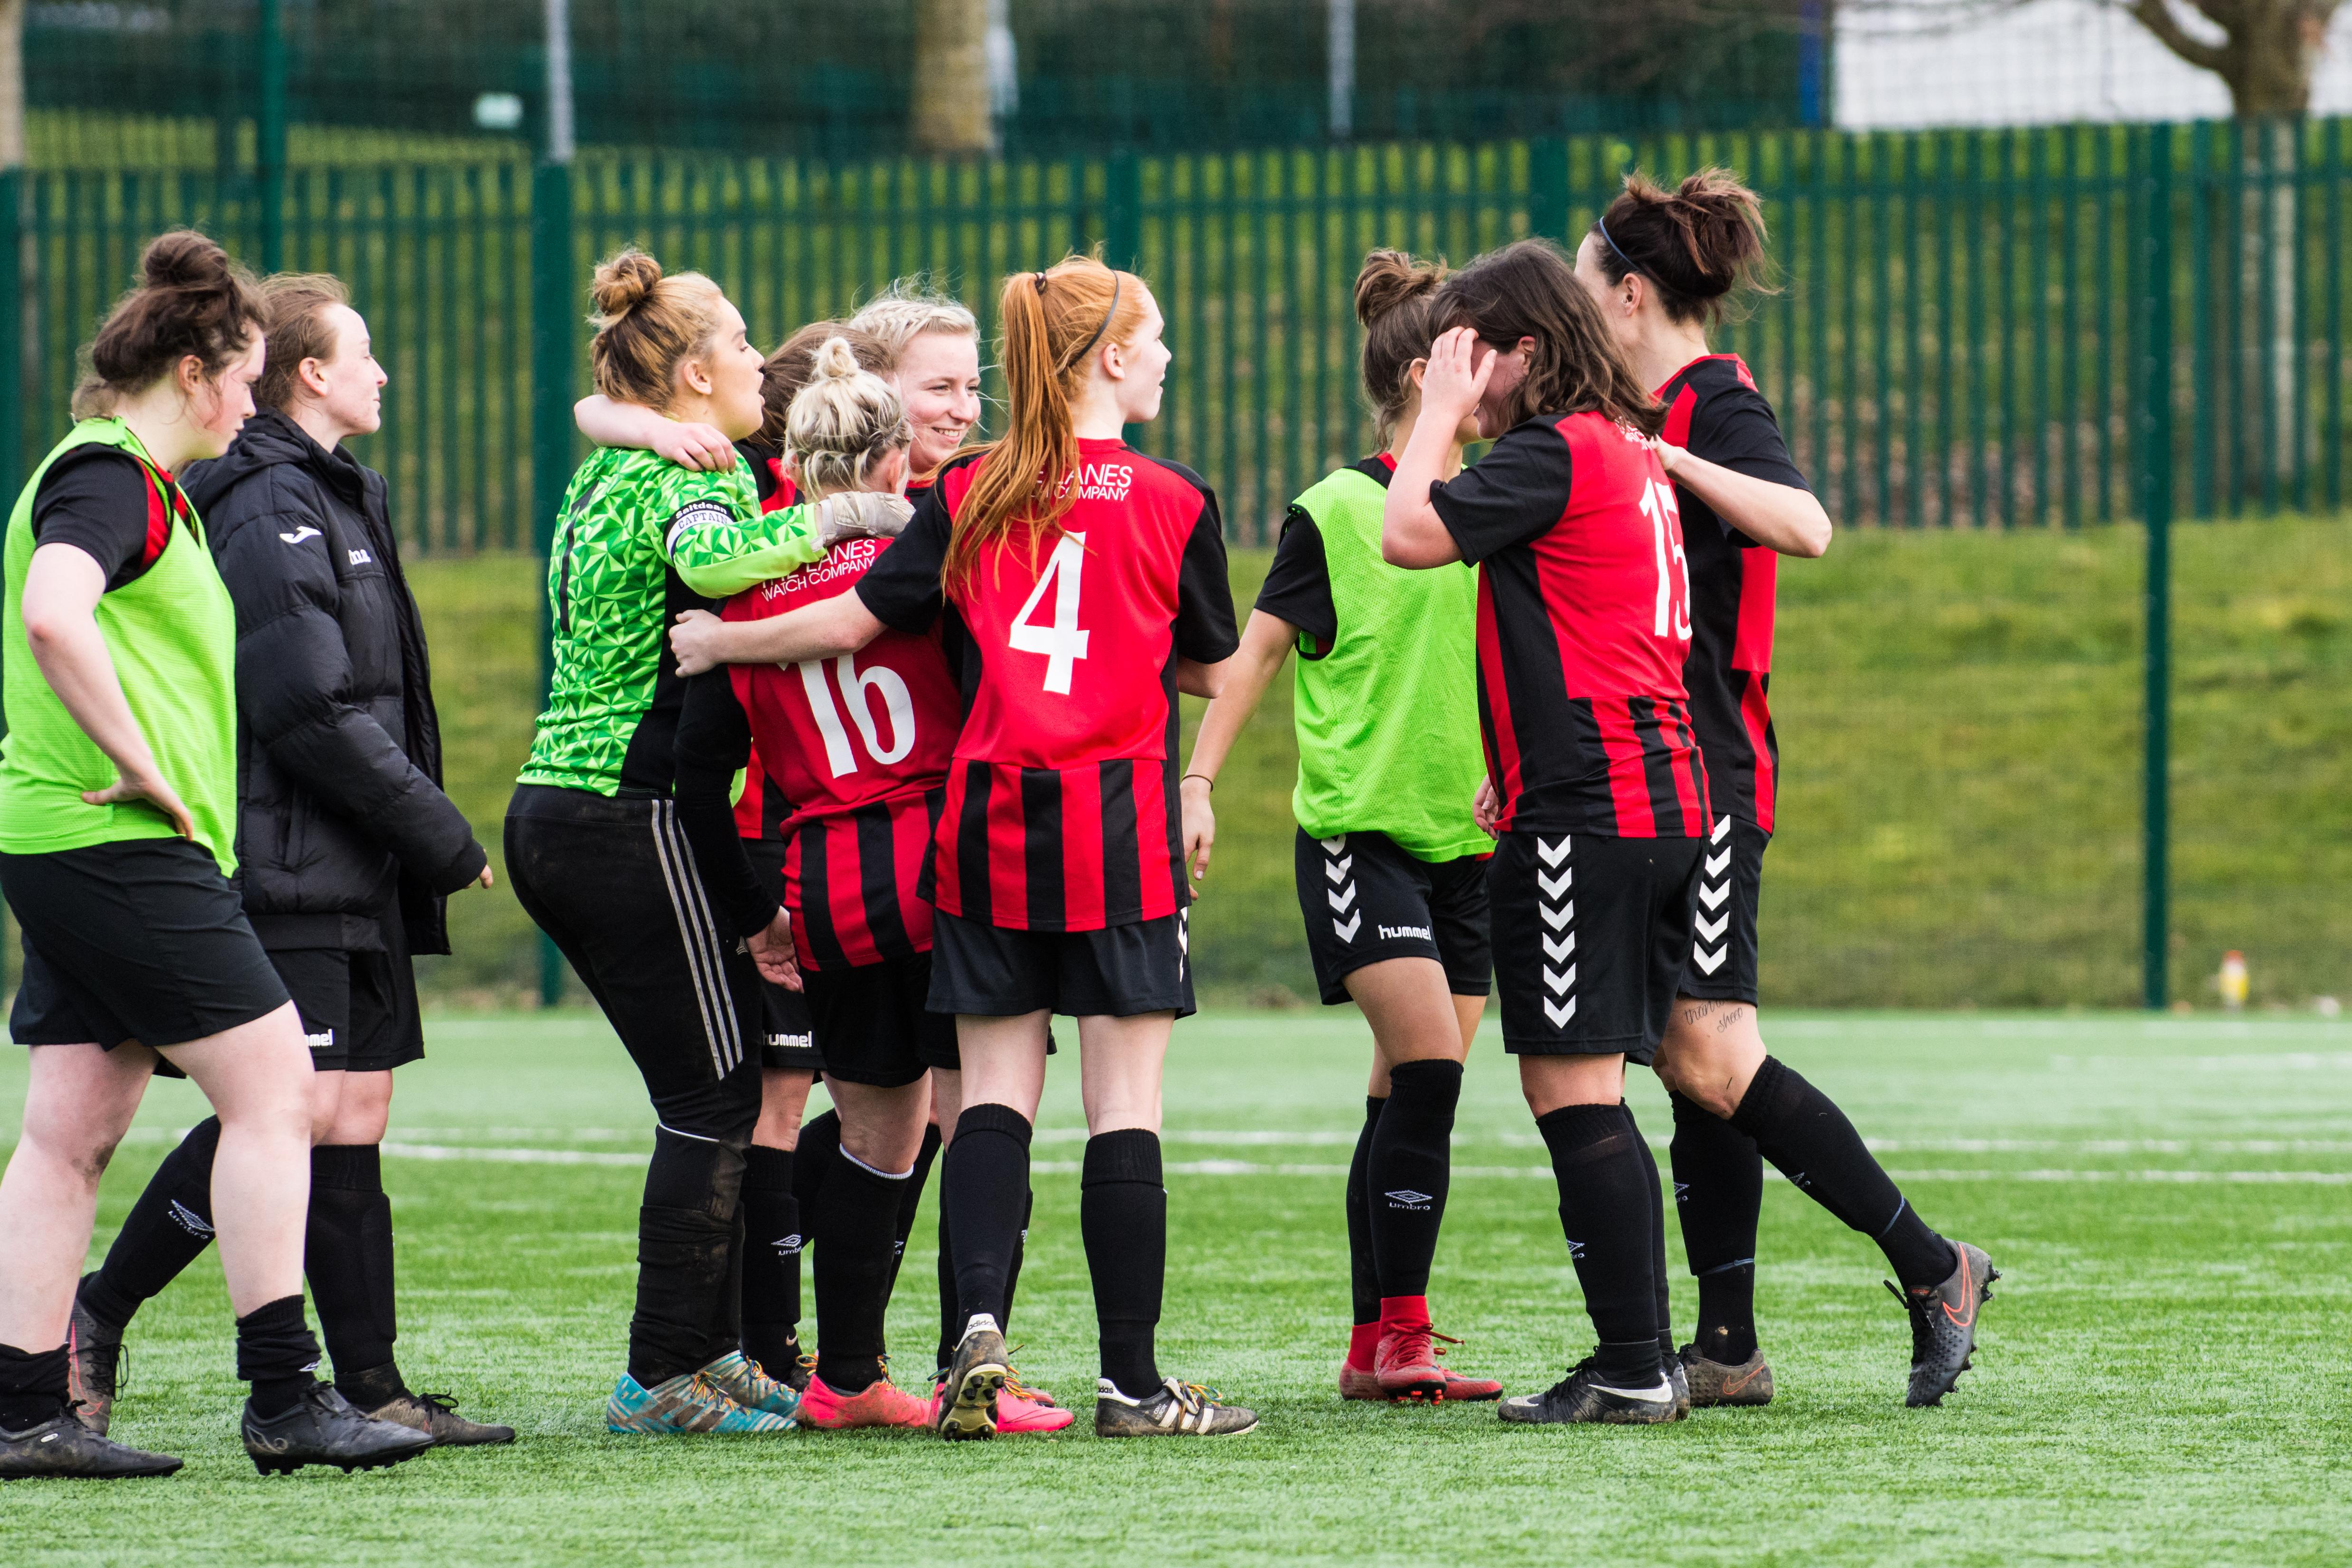 DAVID_JEFFERY Saltdean Utd Ladies FC vs Worthing Utd Ladies FC 11.03.18 62